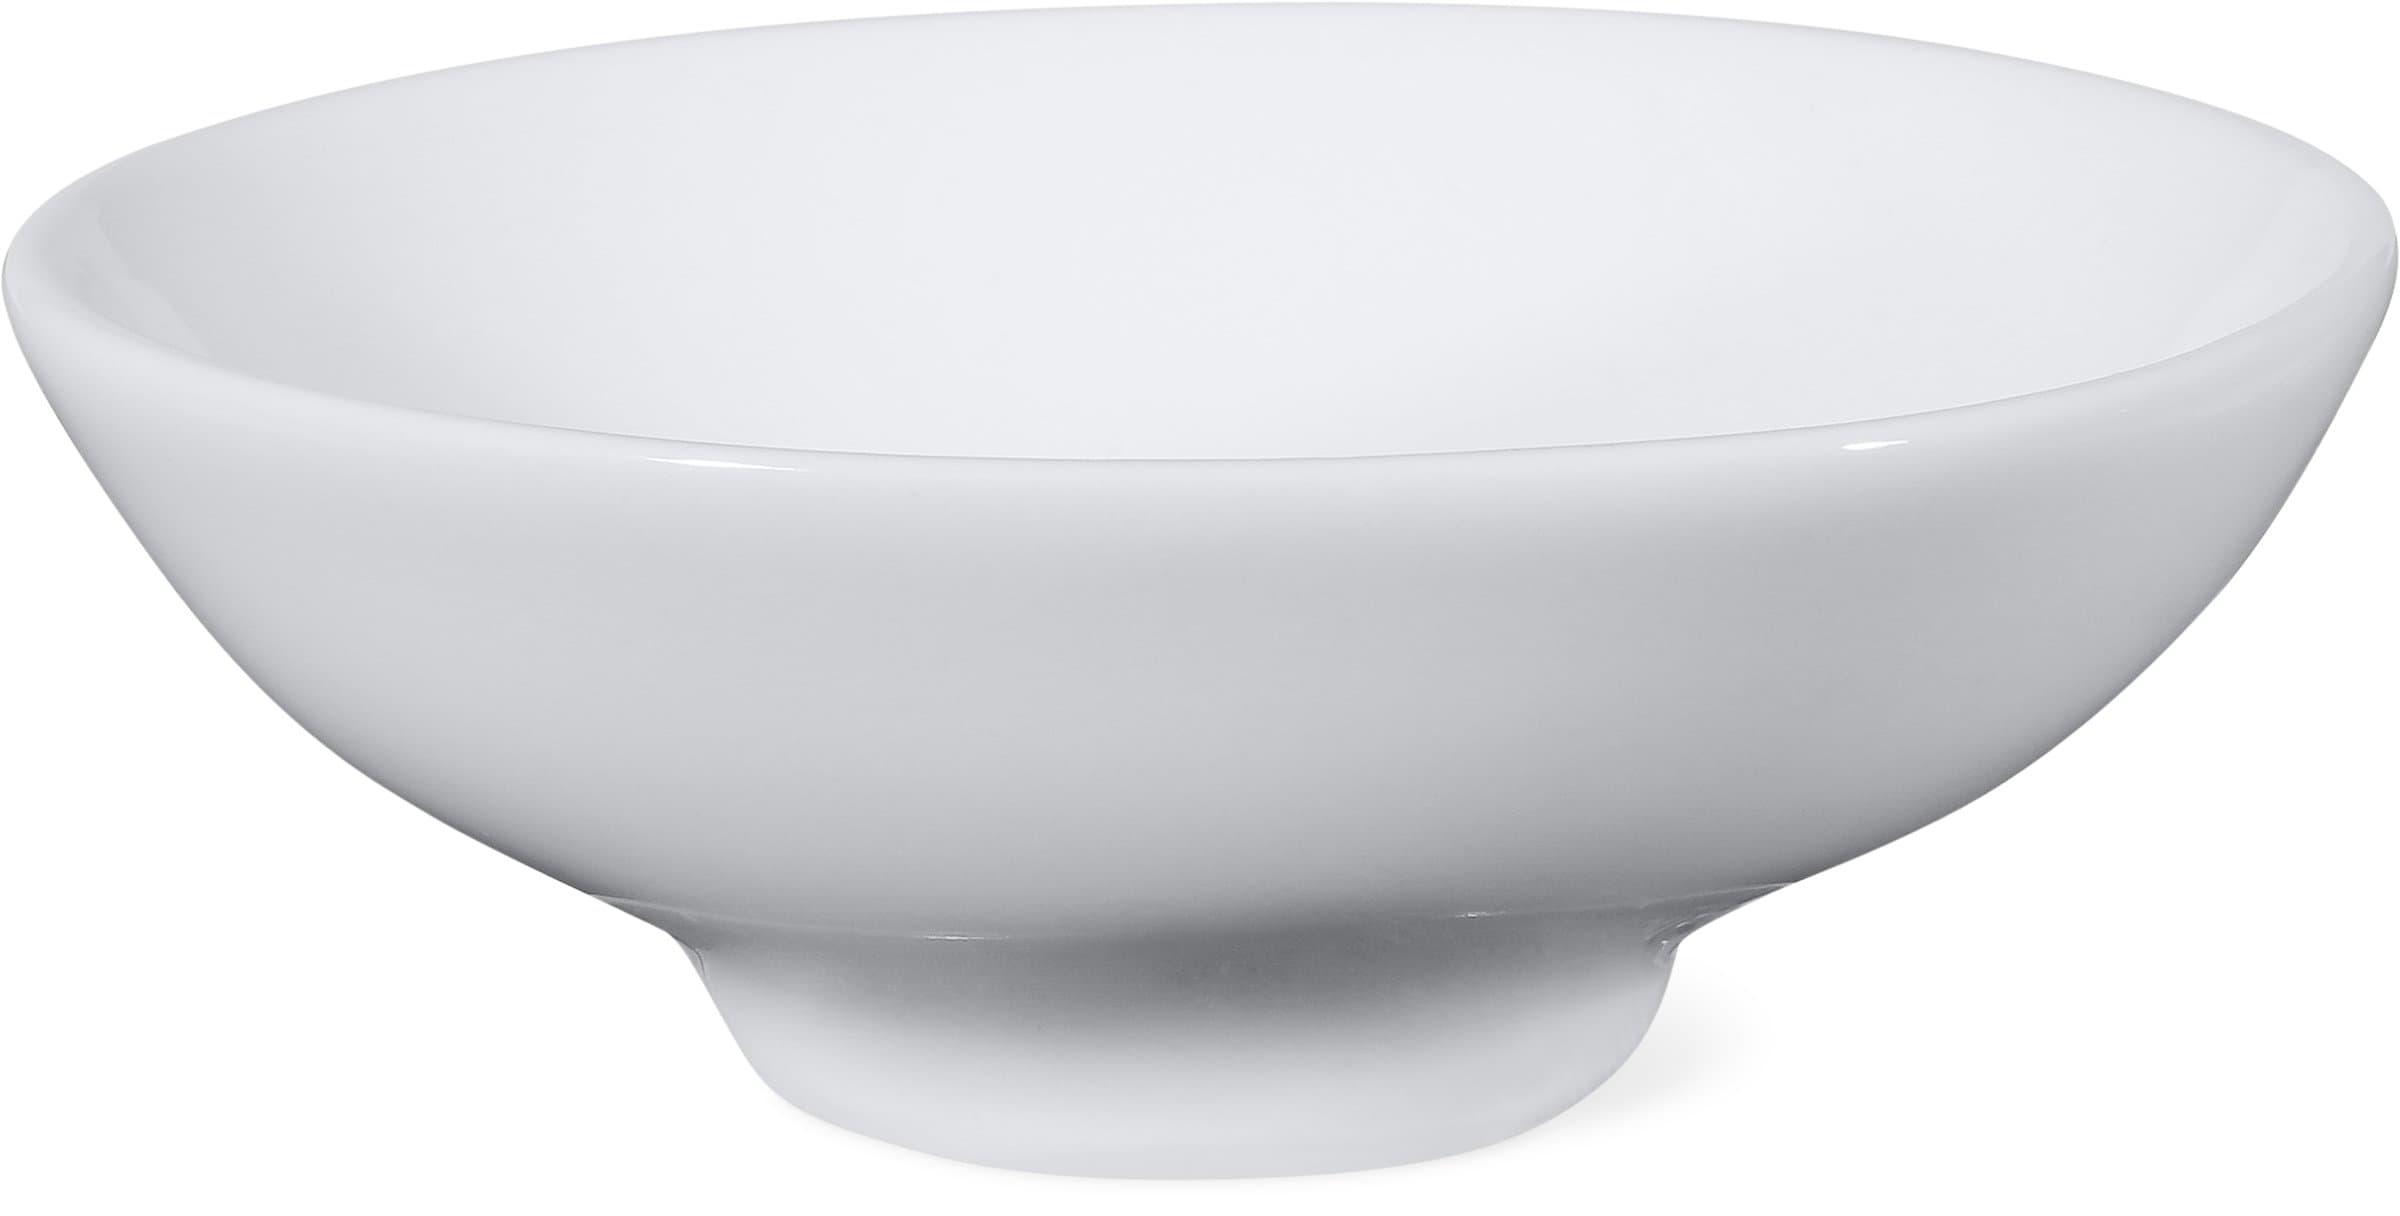 Cucina & Tavola PURE Schüssel 9.5x8cm